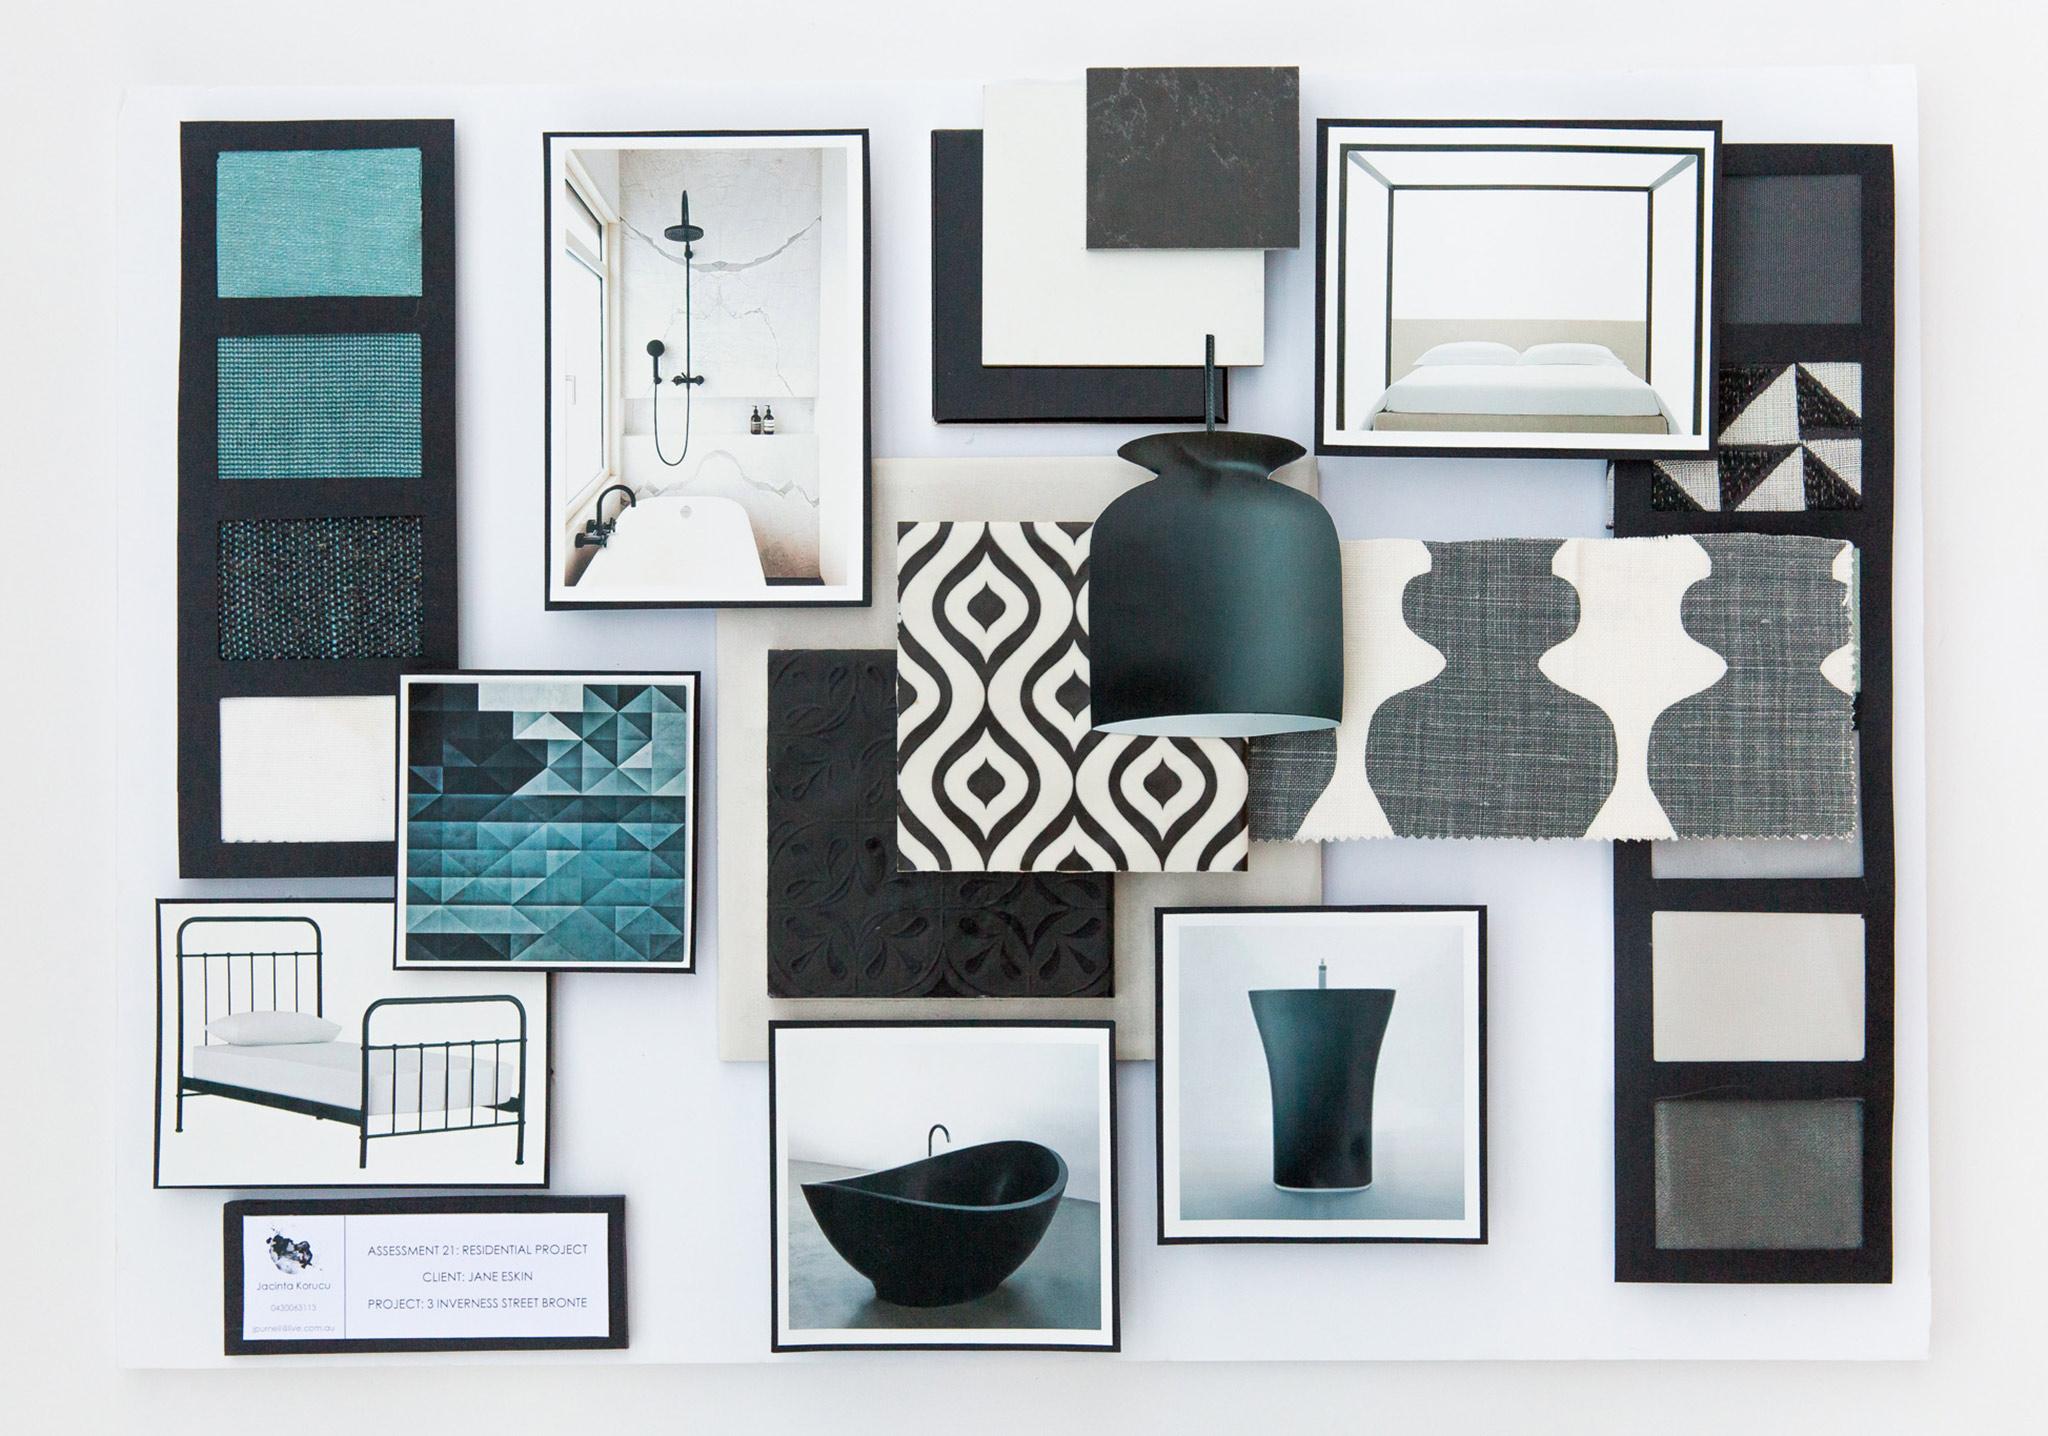 Student work interior design online - Interior design sample board software ...